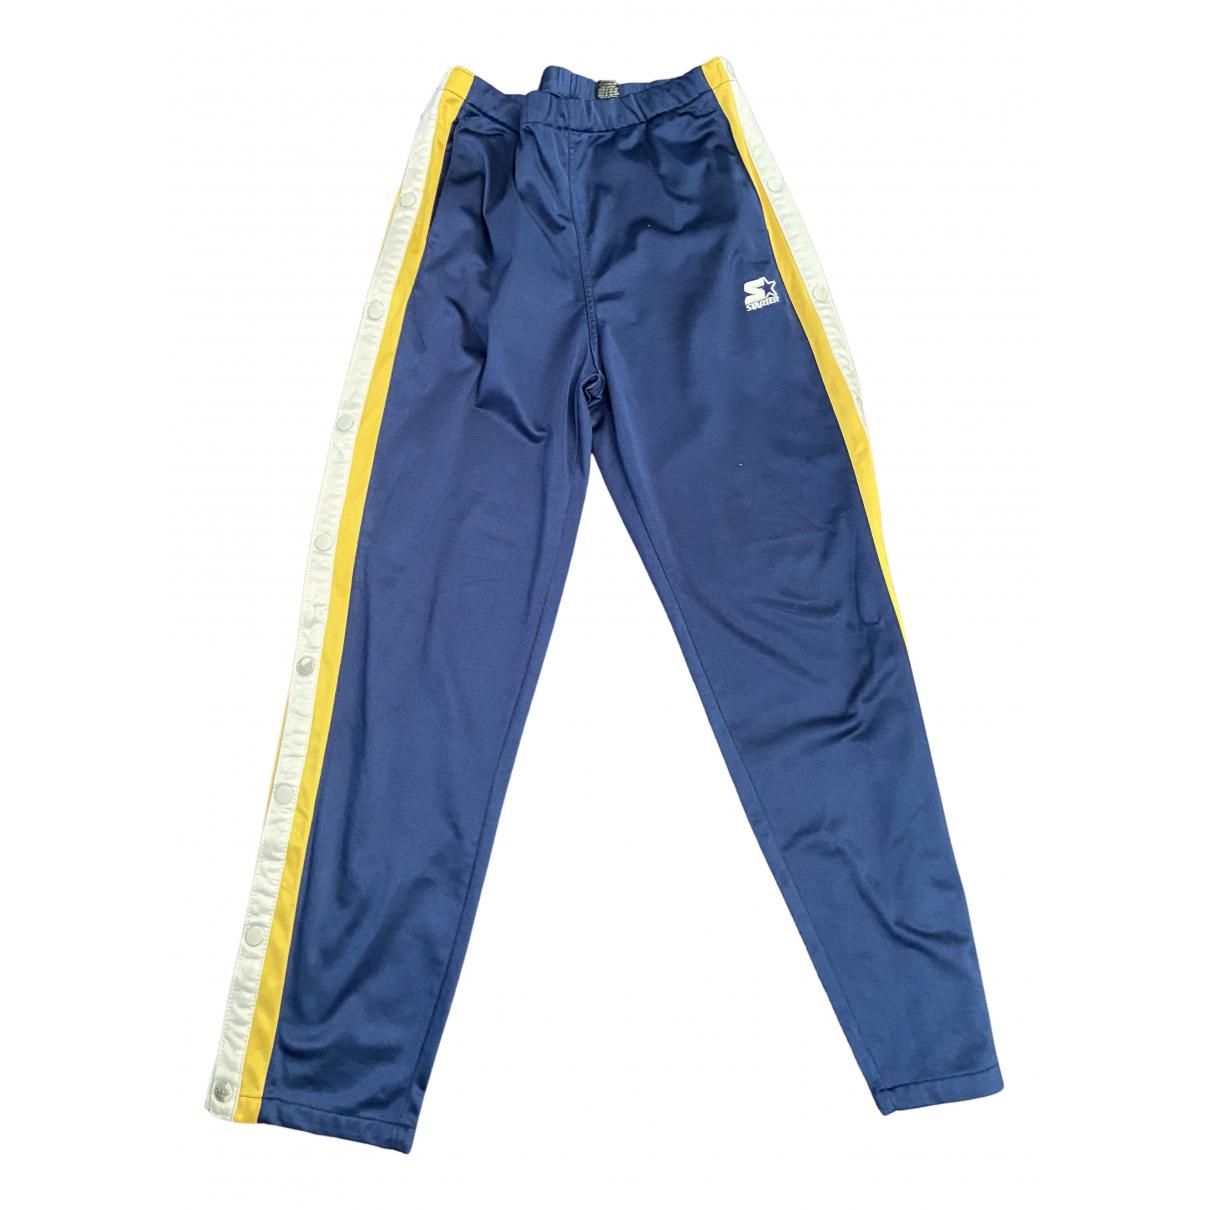 Pantalones Oversize en Algodon Azul Non Signe / Unsigned